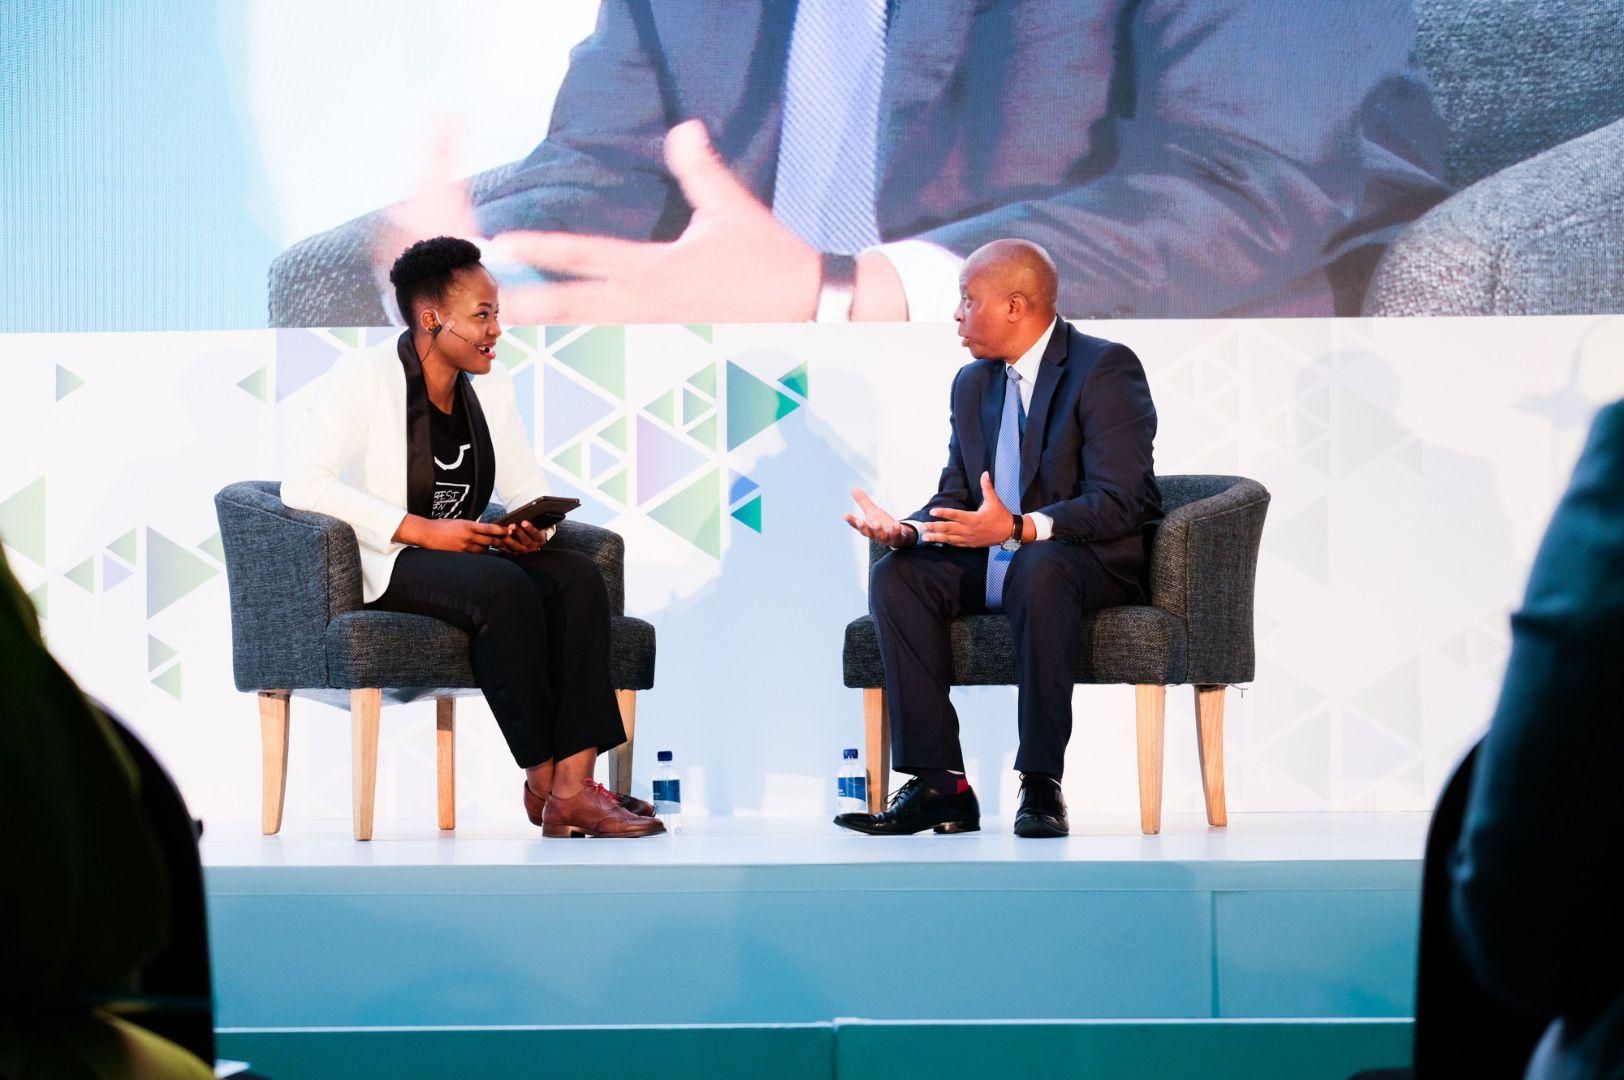 Herman Mashaba - Business Day TV SME Summit South Africa